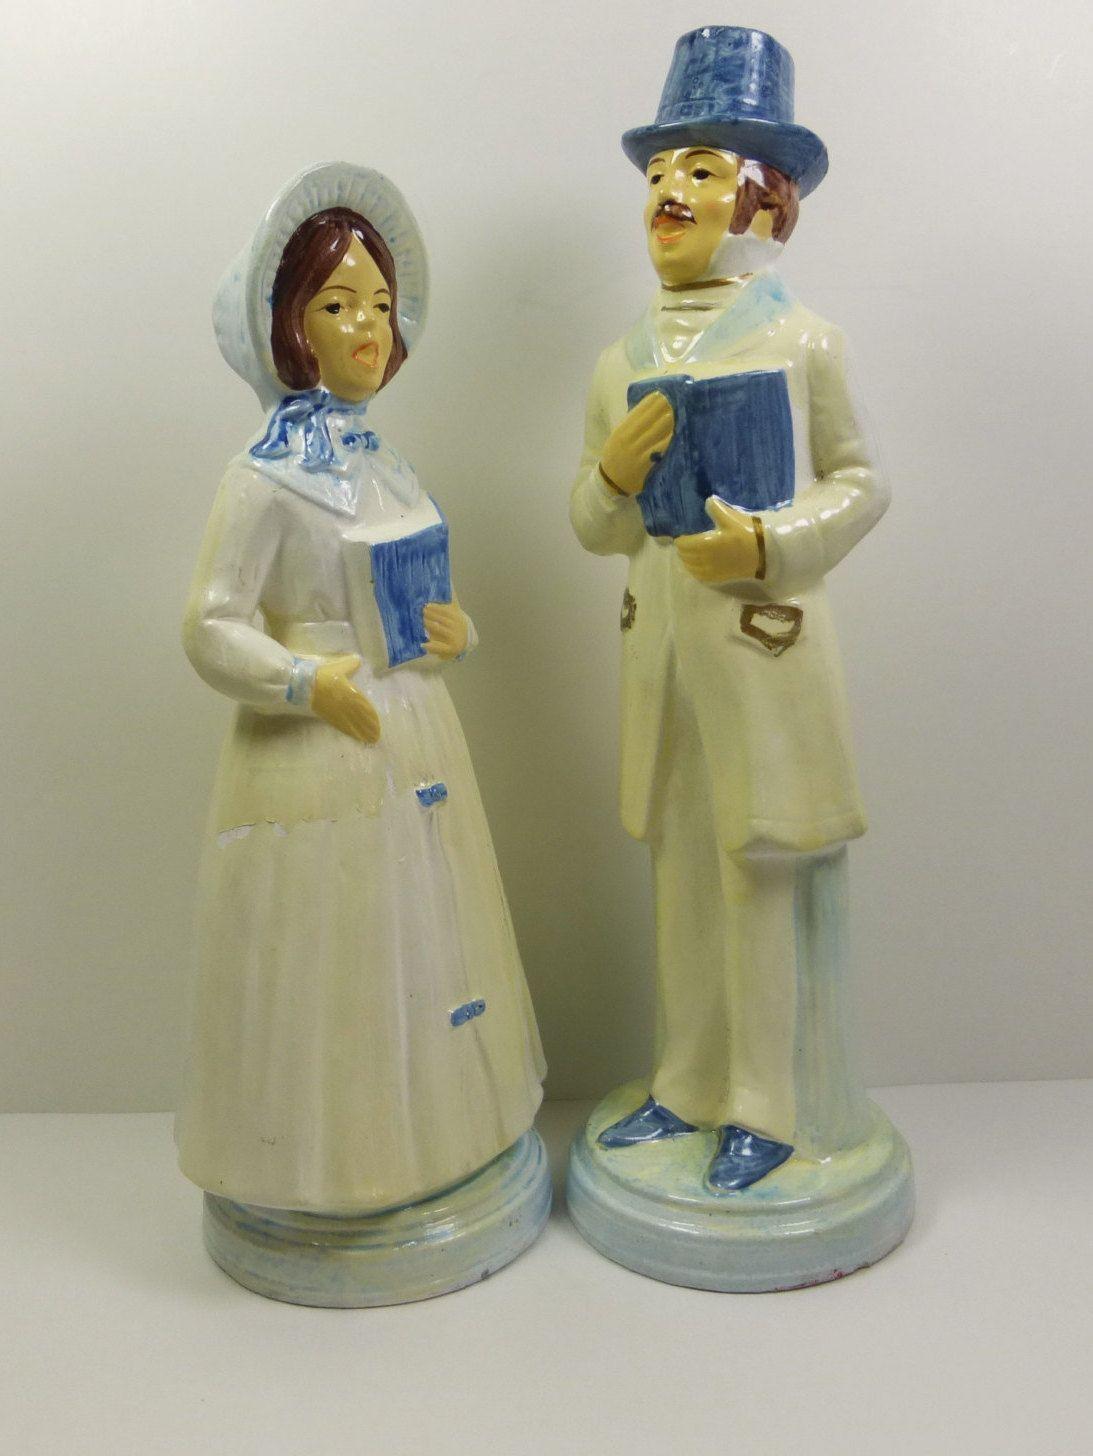 Christmas Carol Singers Figurines.Victorian Christmas Caroler Figurines 1960s Blue And White